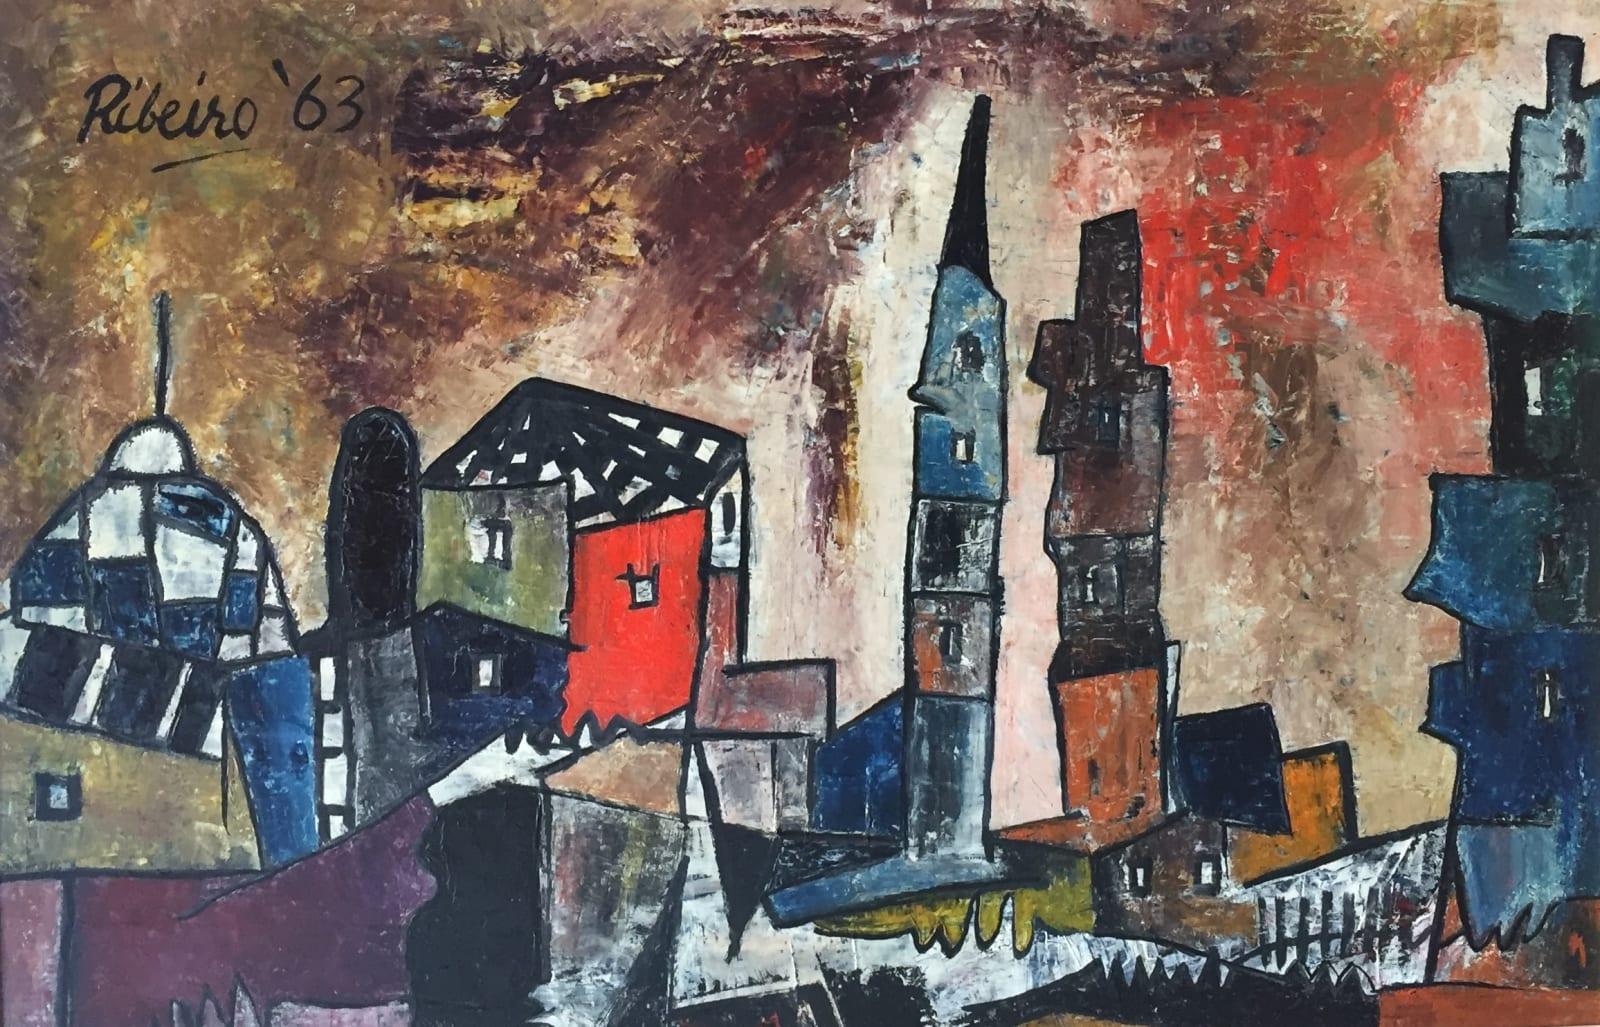 Lancelot Ribeiro, The City I, 1963